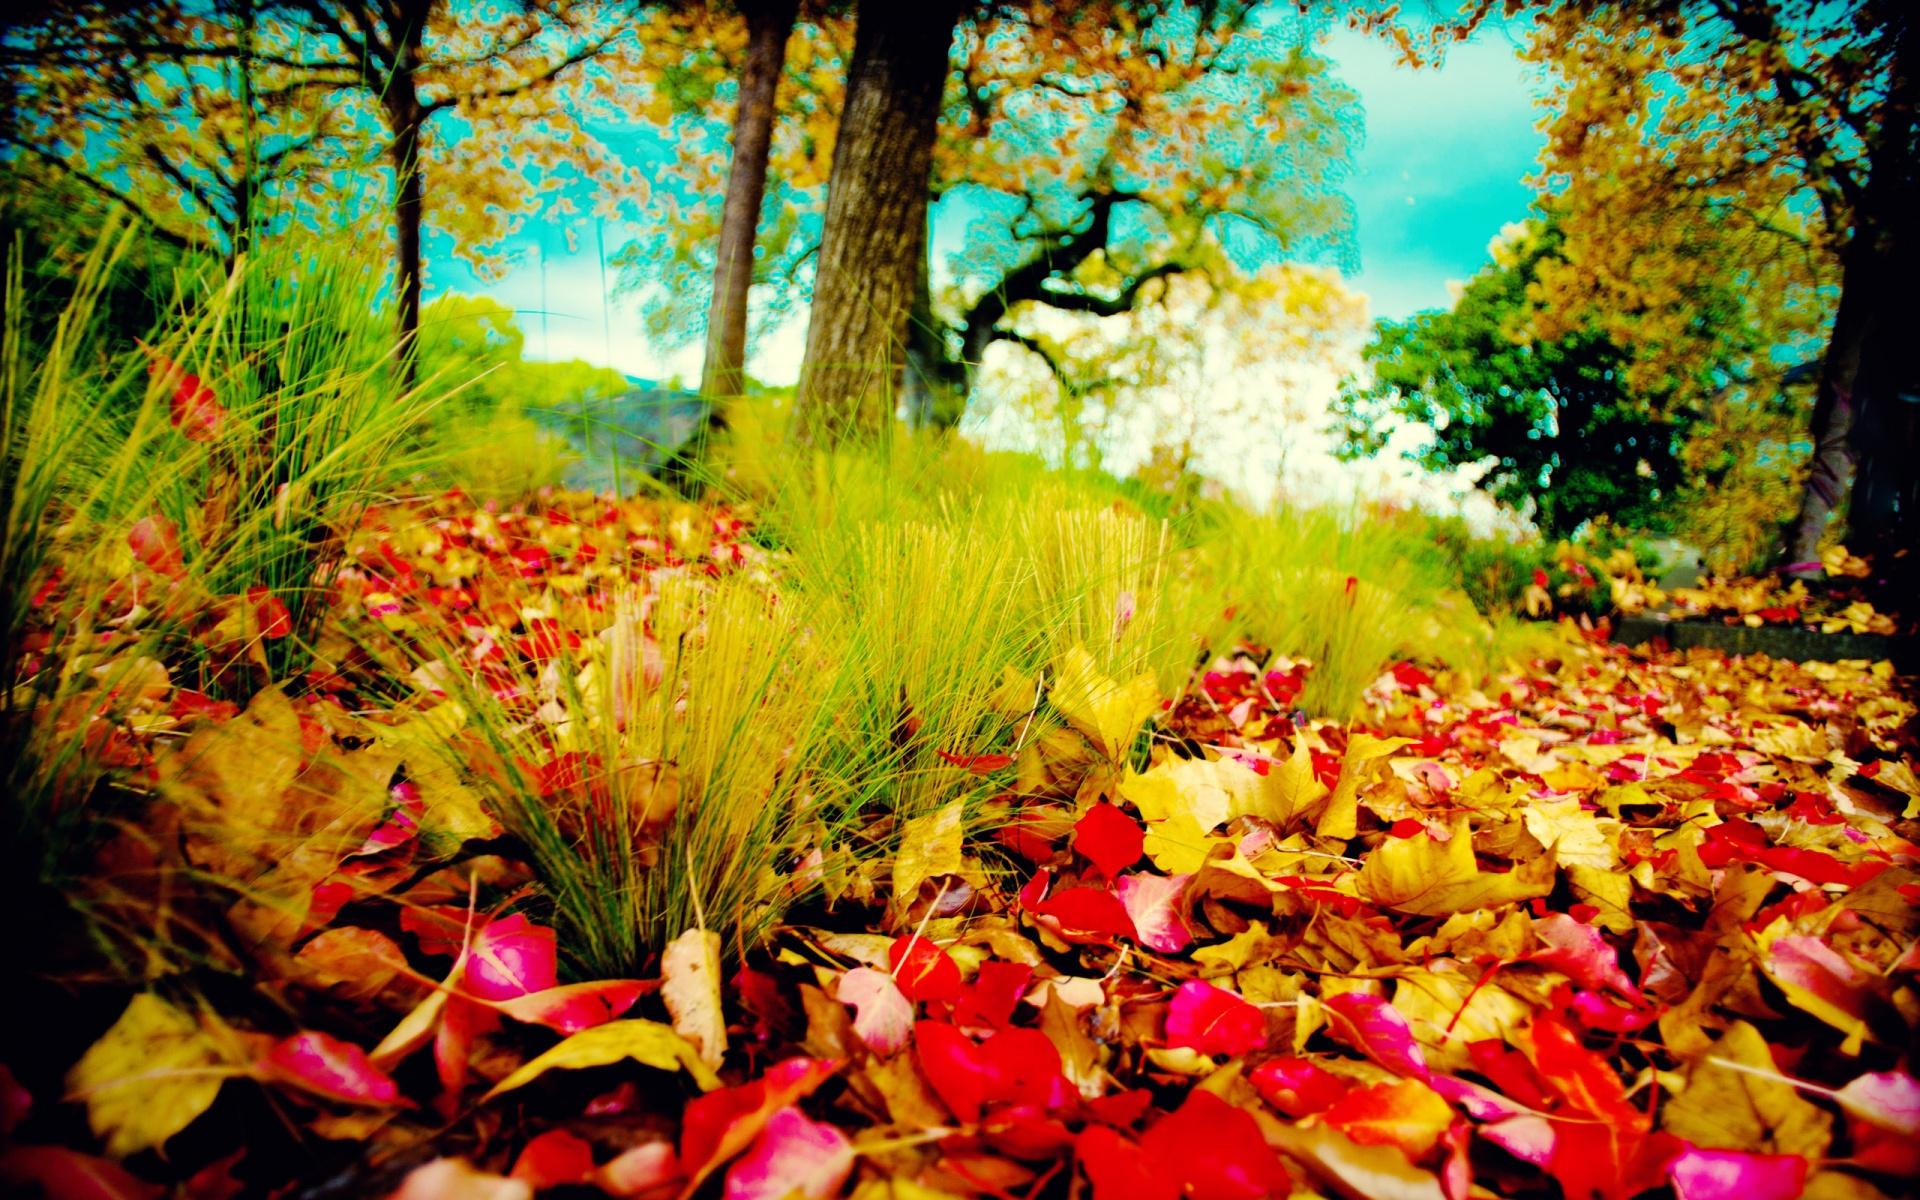 fall colors desktop wallpaper - www.wallpapers-in-hd.com